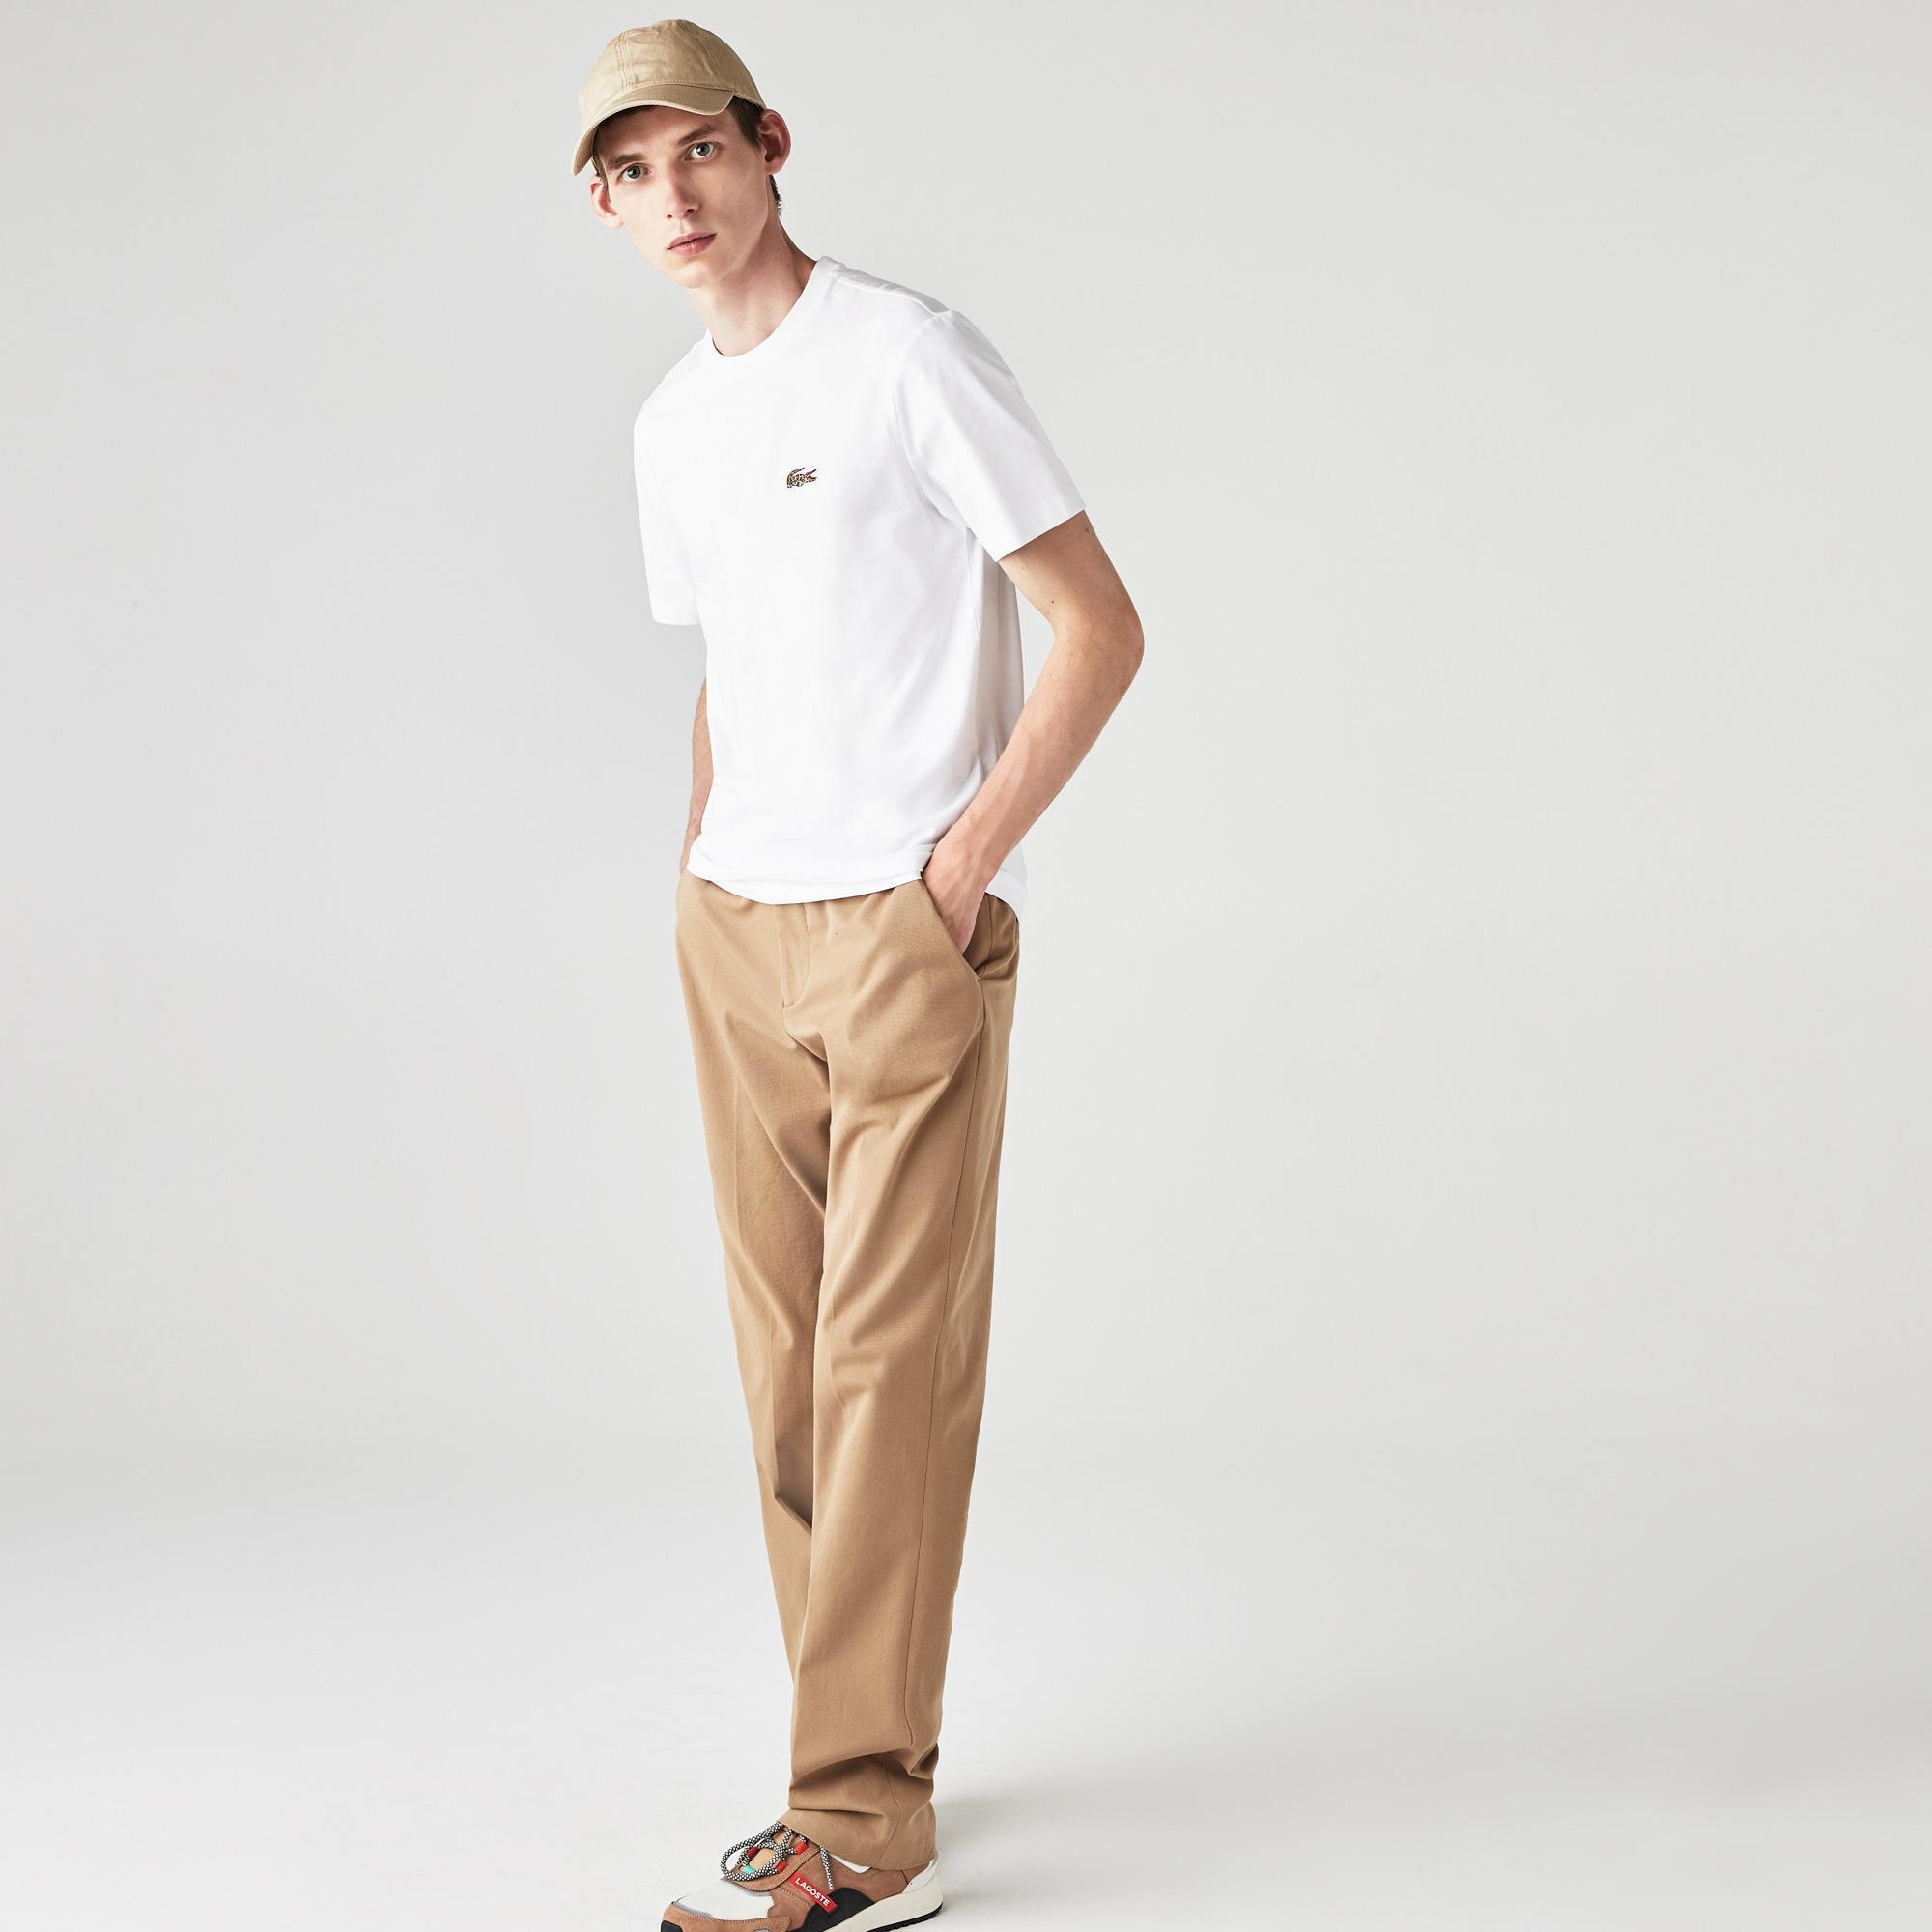 Lacoste Men's x National Geographic Organic Cotton T-shirt